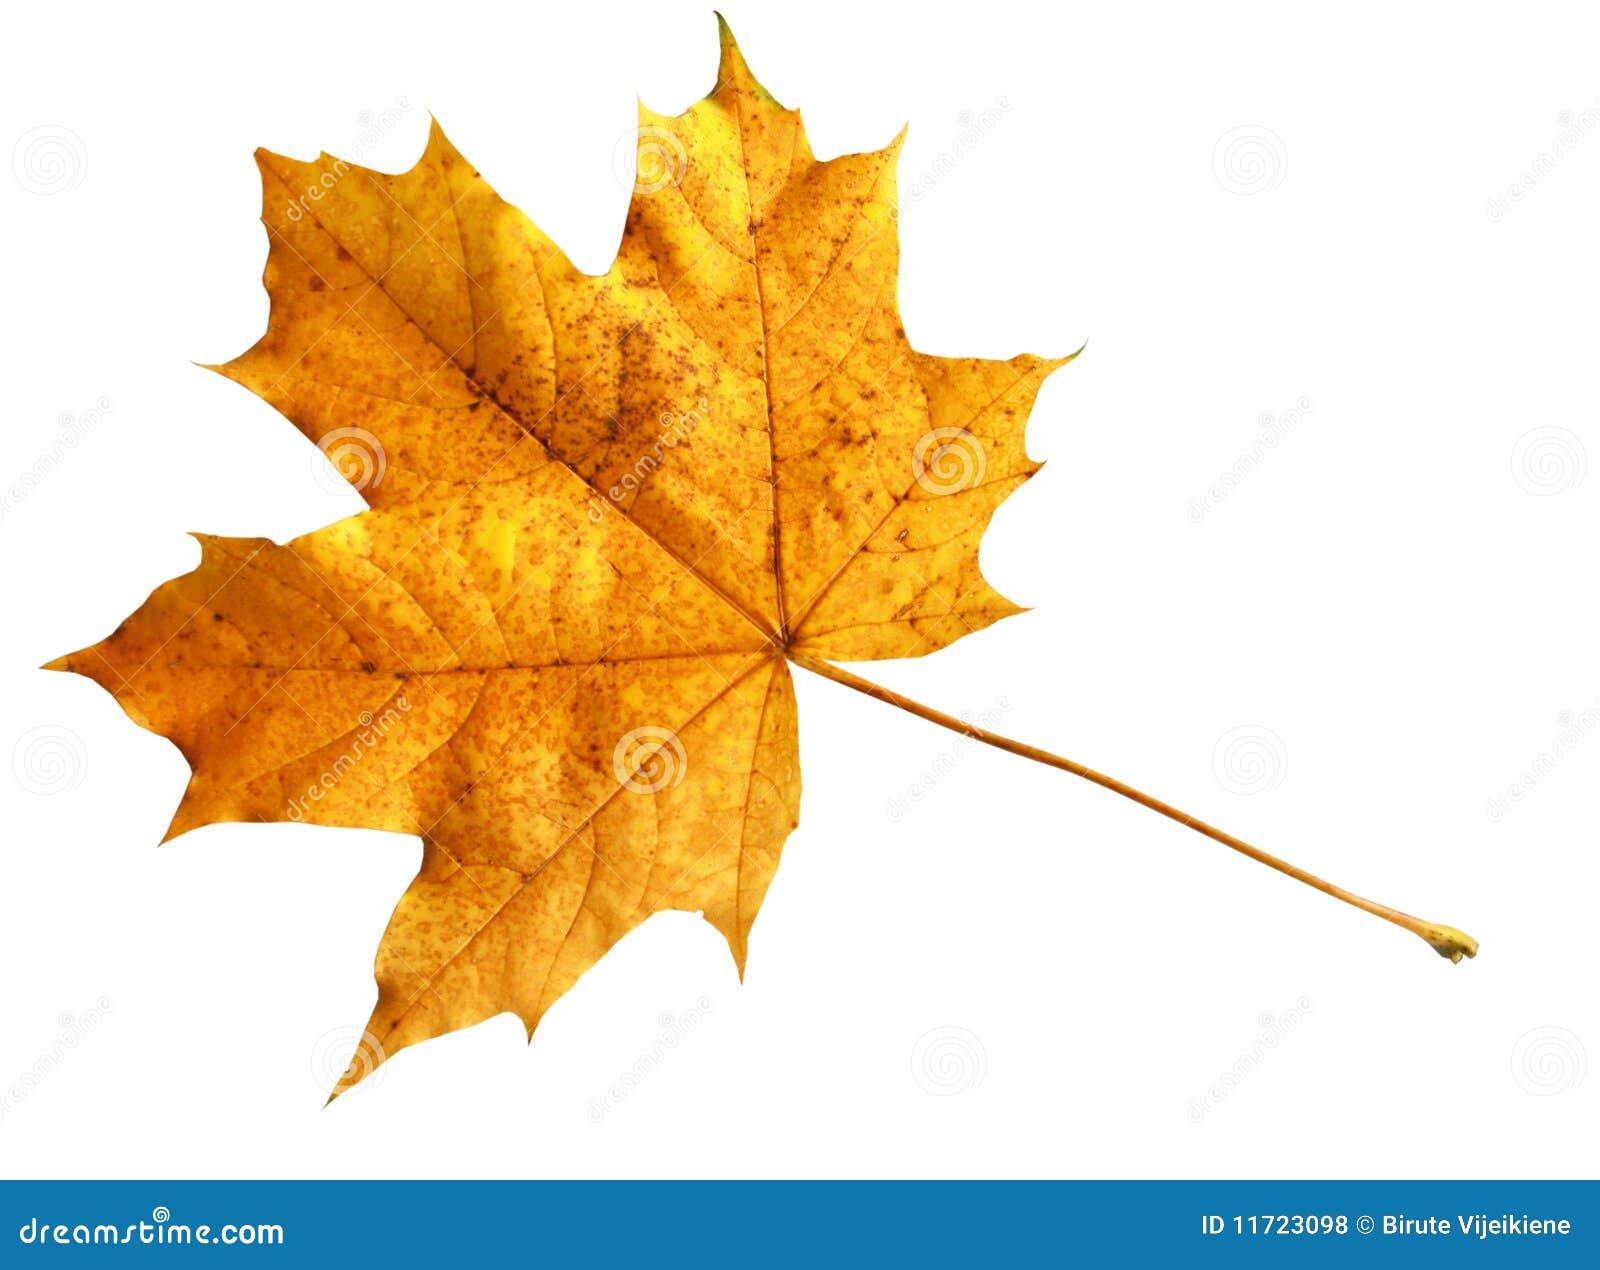 Orange leaf royalty free stock photos image 11723098 for Amber leaf